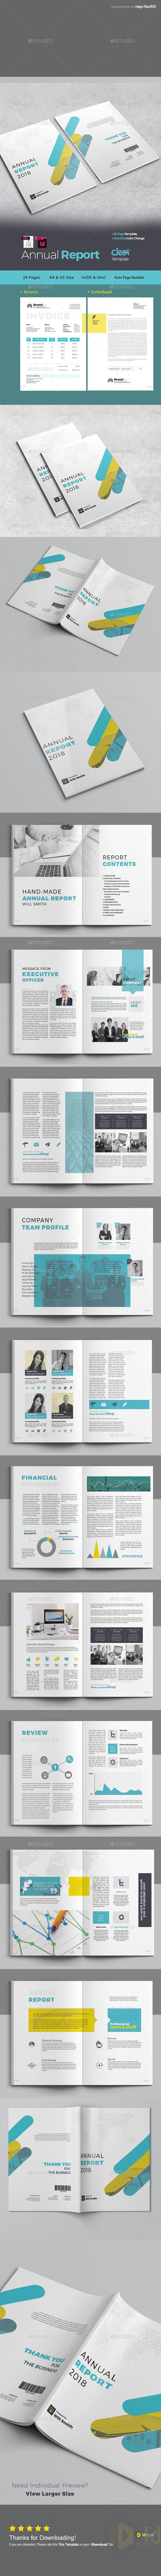 Annual Report Magazines Print Templates